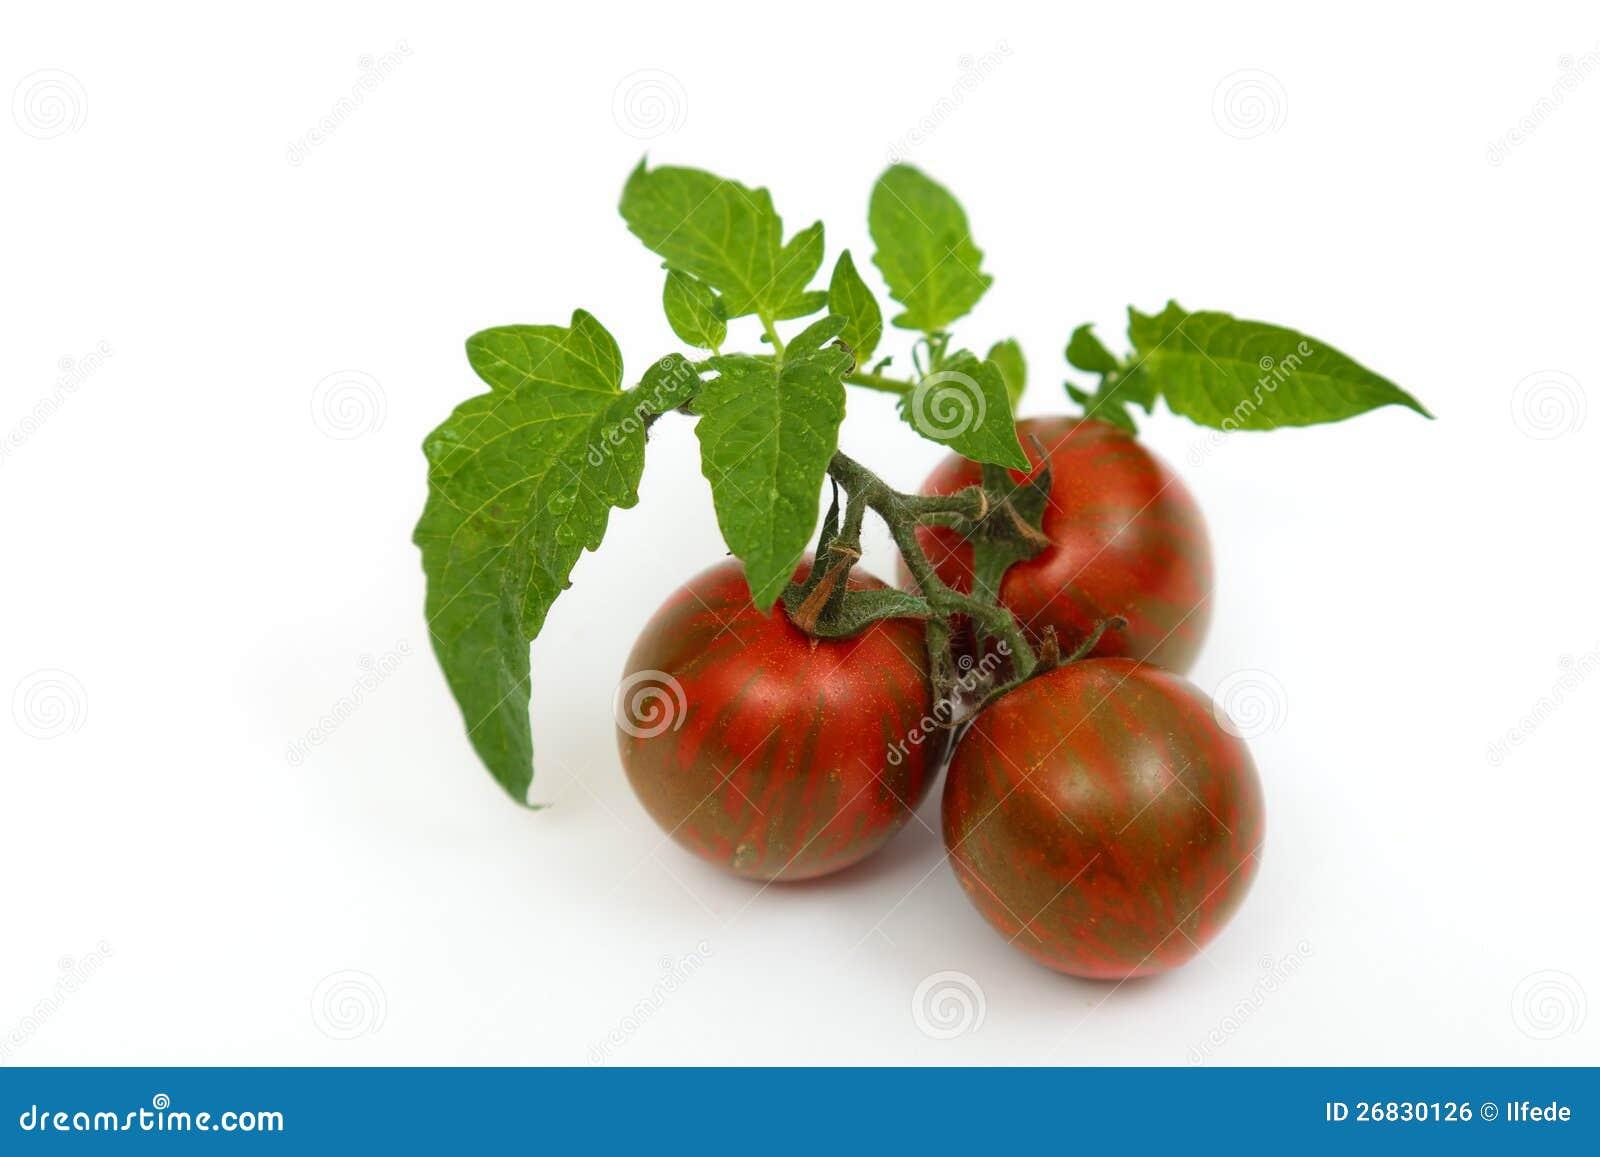 Black Krim Tomatoes Royalty Free Stock Image - Image: 26830126